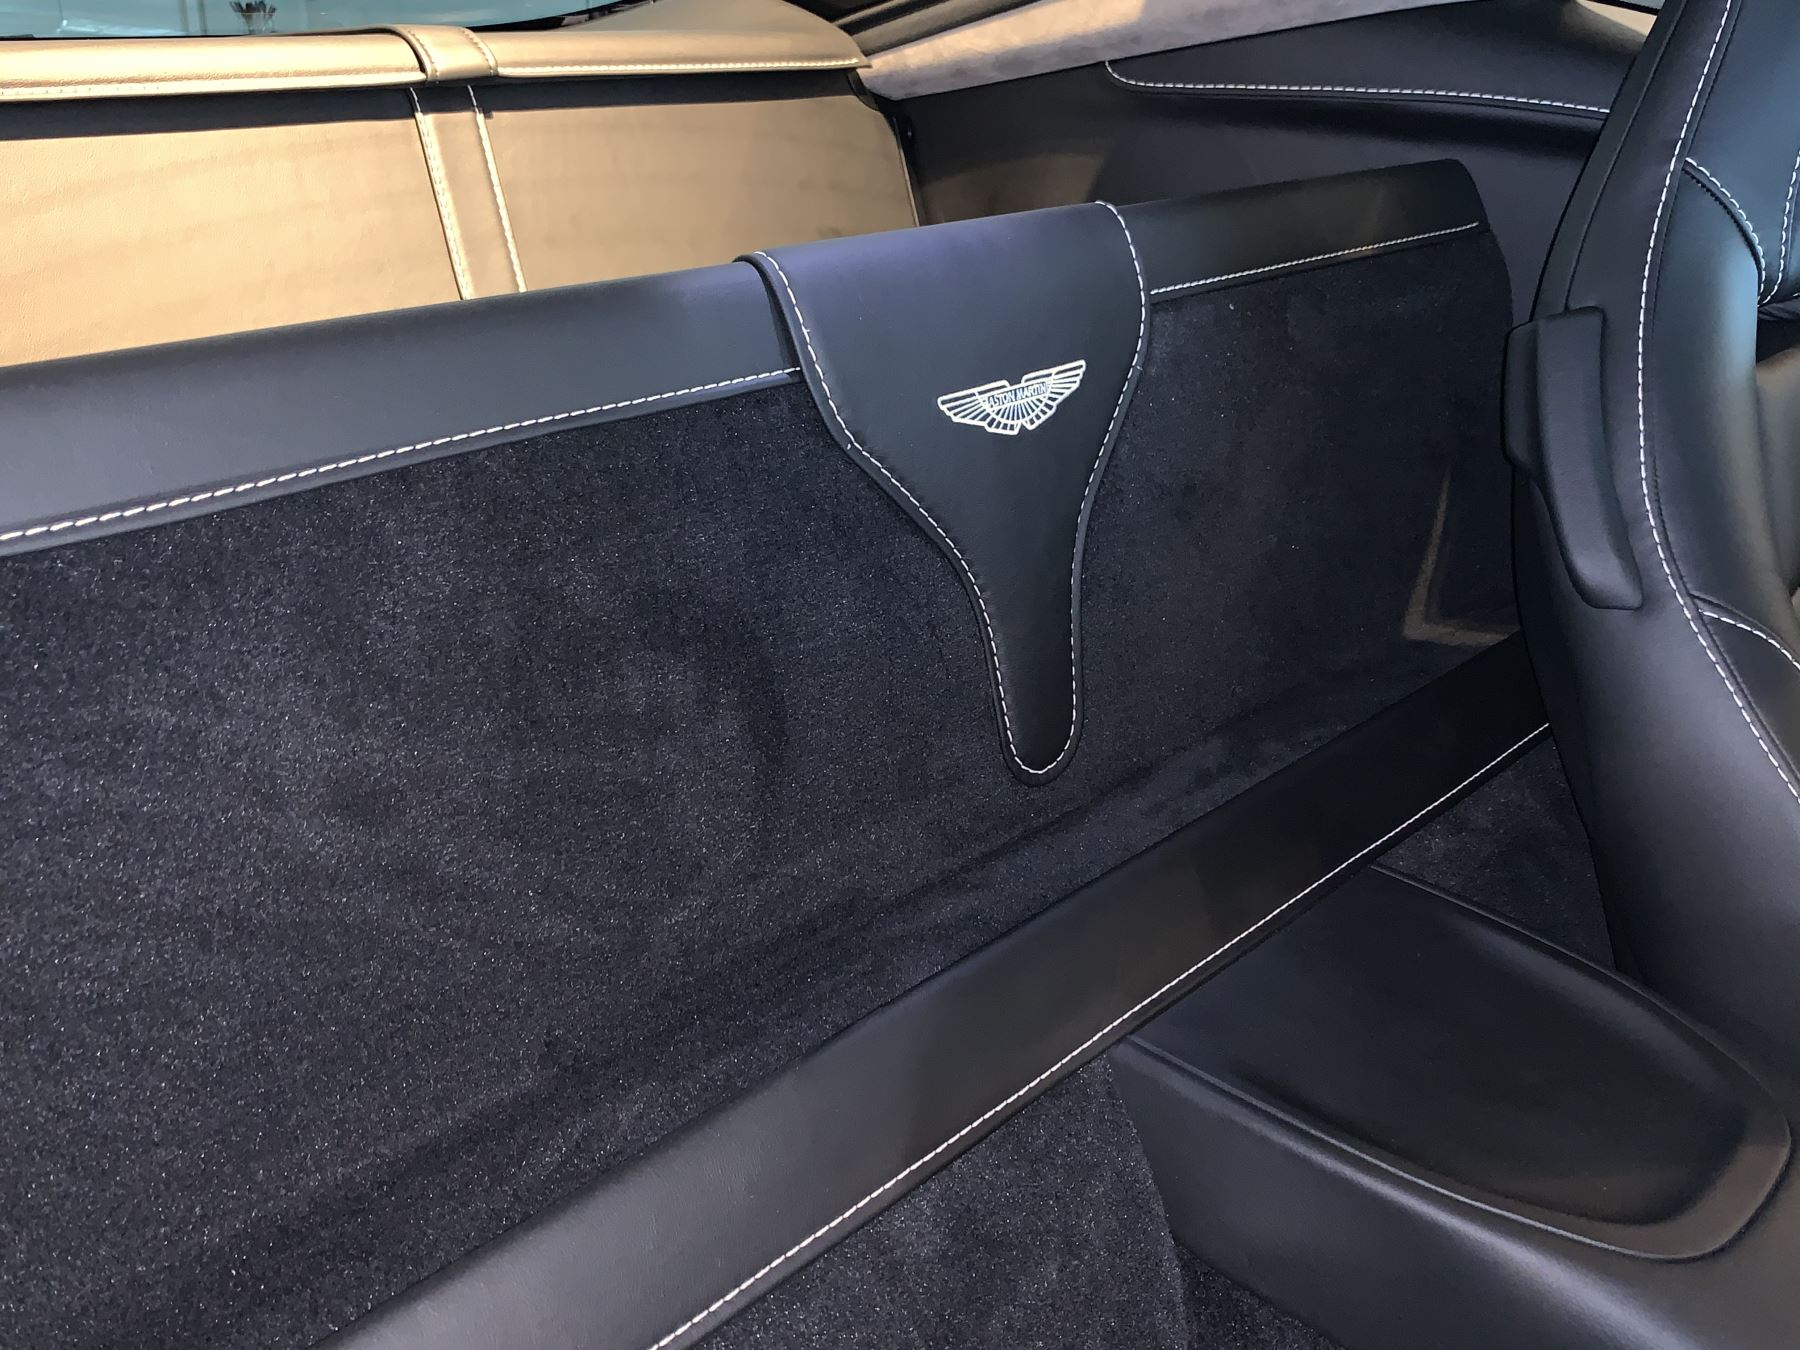 Aston Martin New Vantage 2dr ZF 8 Speed image 44